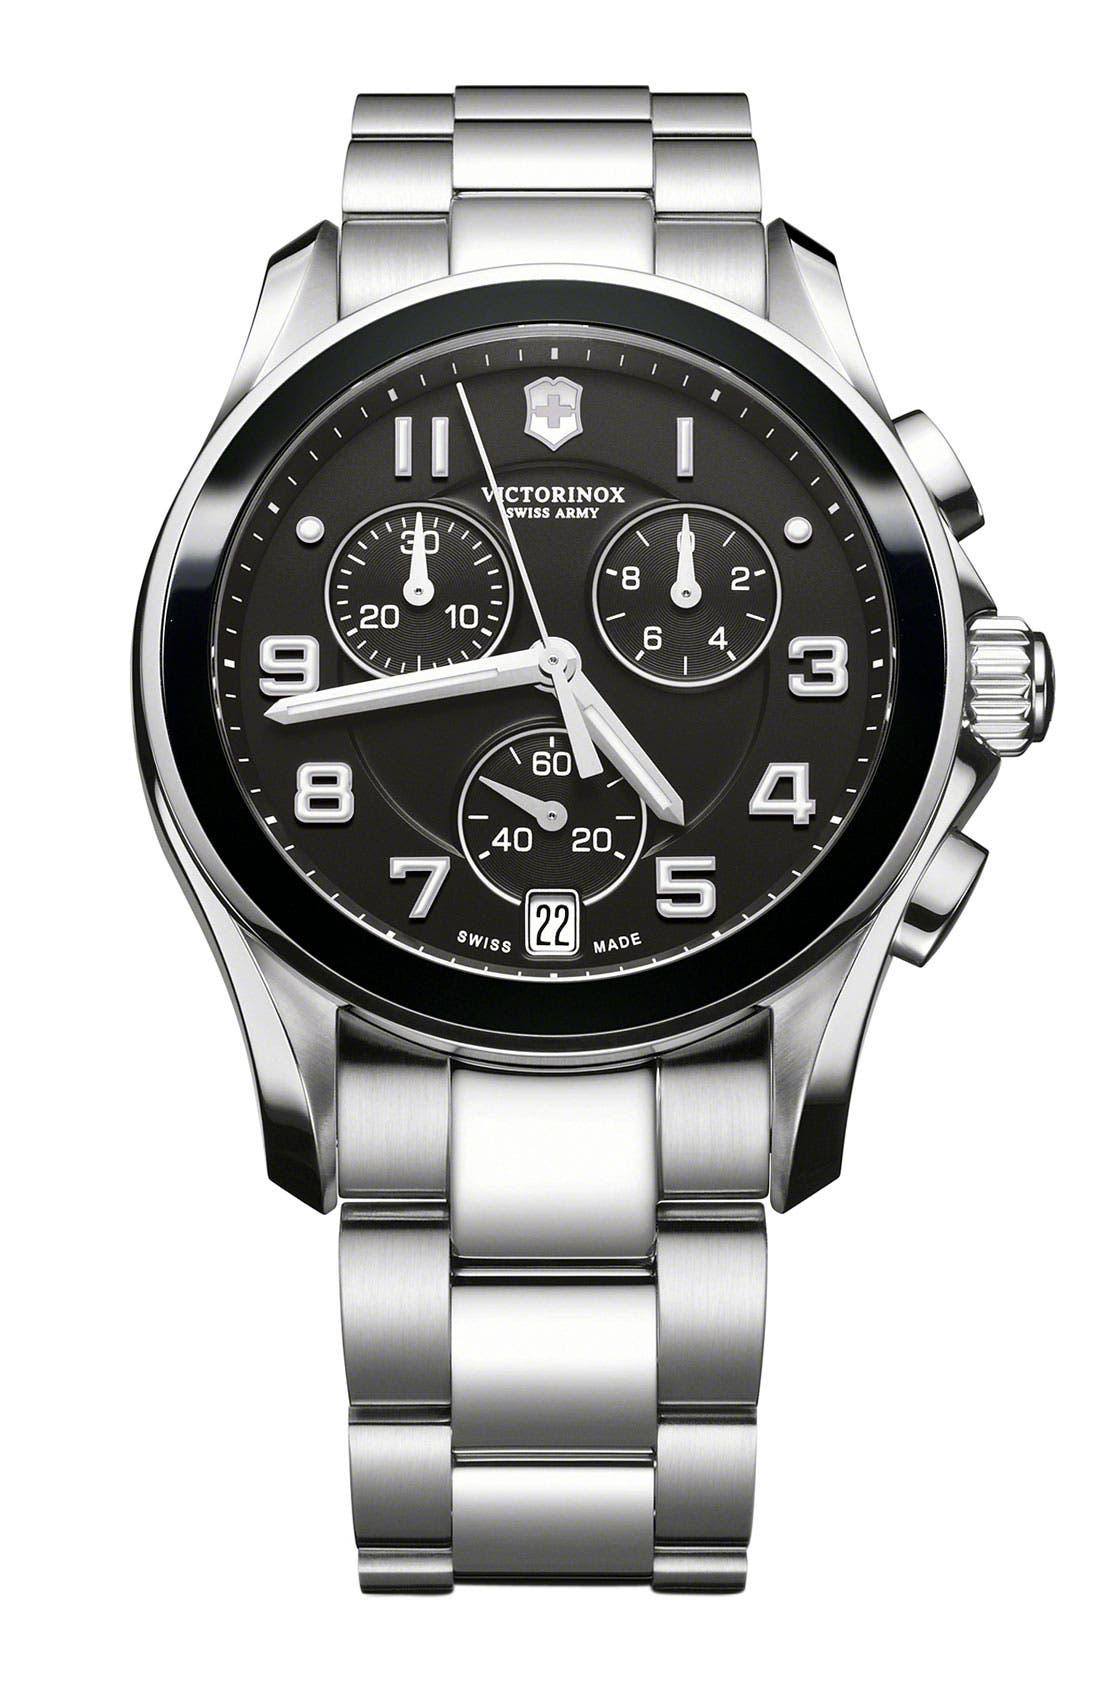 Main Image - Victorinox Swiss Army® 'Chrono Classic' Watch with Ceramic Bezel